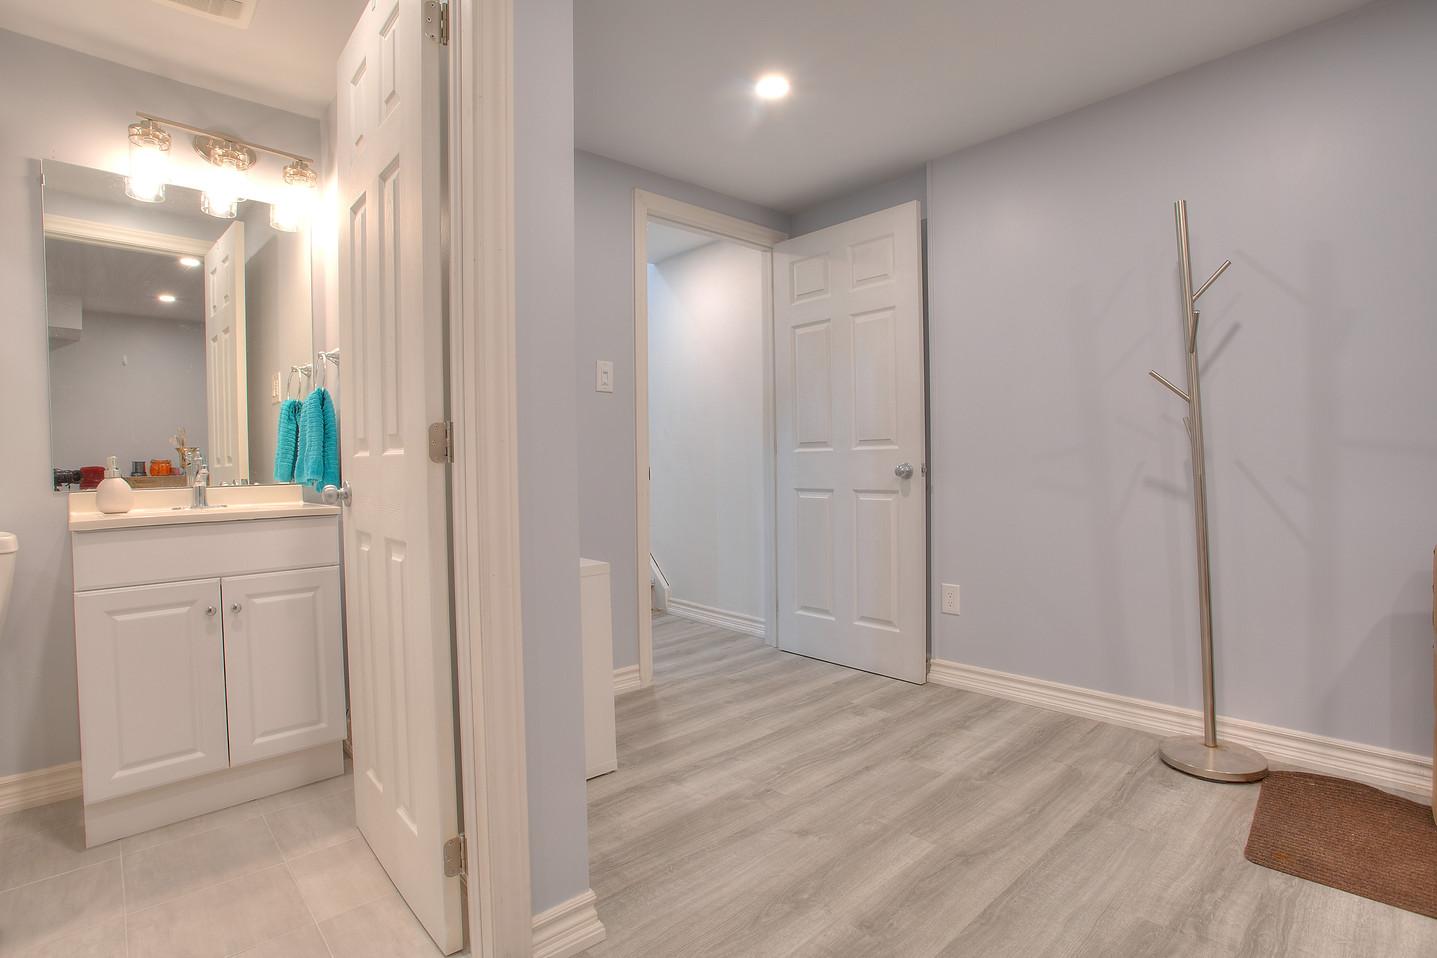 washroom basement 29.jpeg